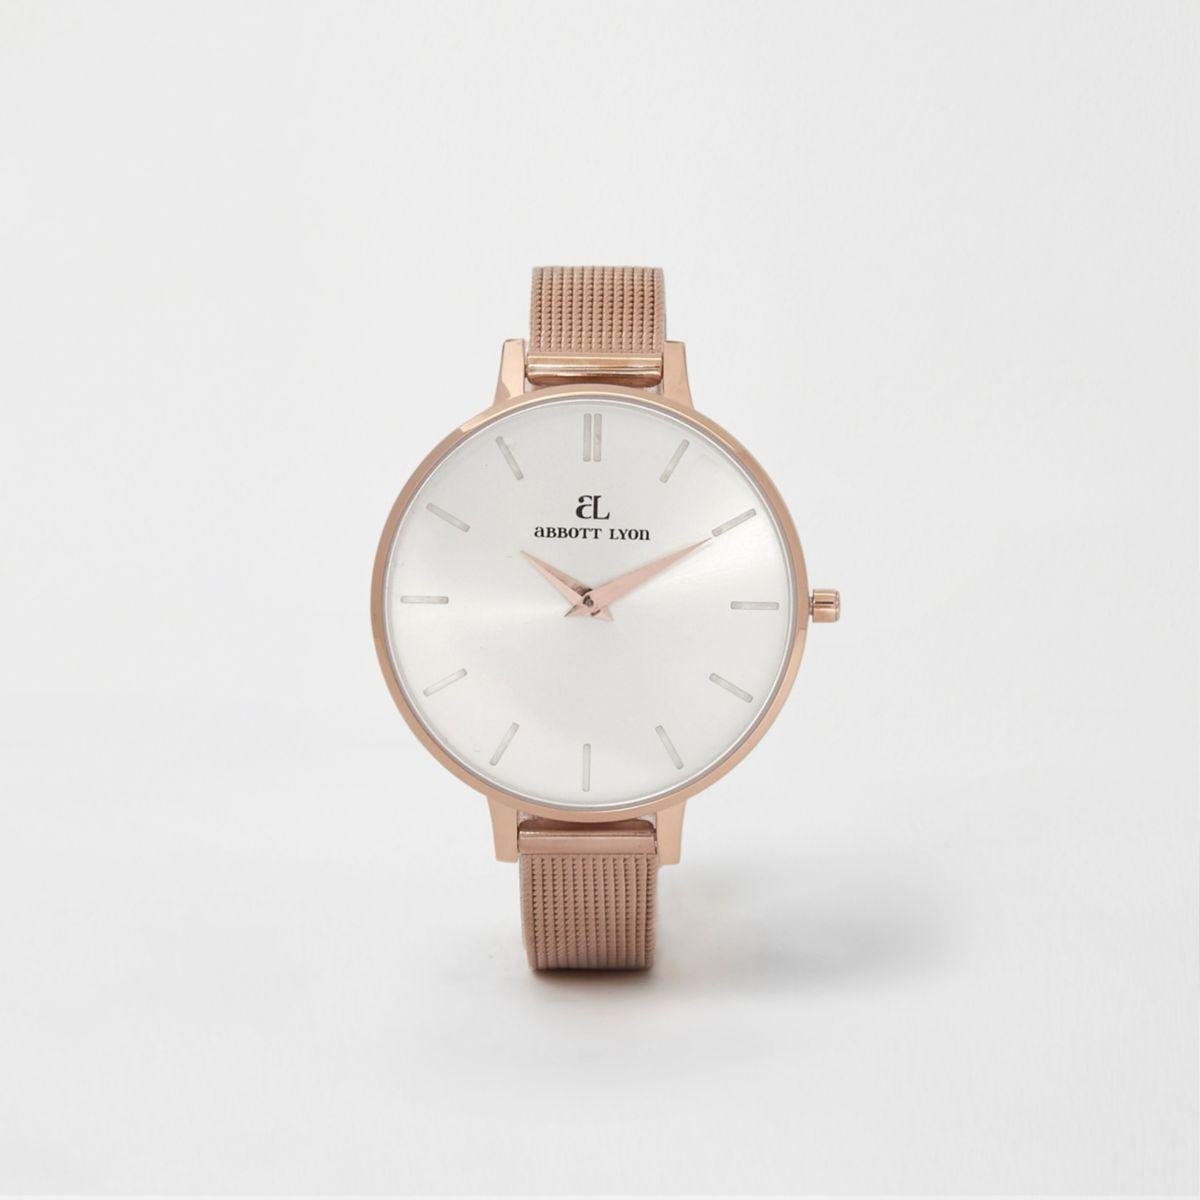 Rose gold plated Abbott Lyon slim mesh watch